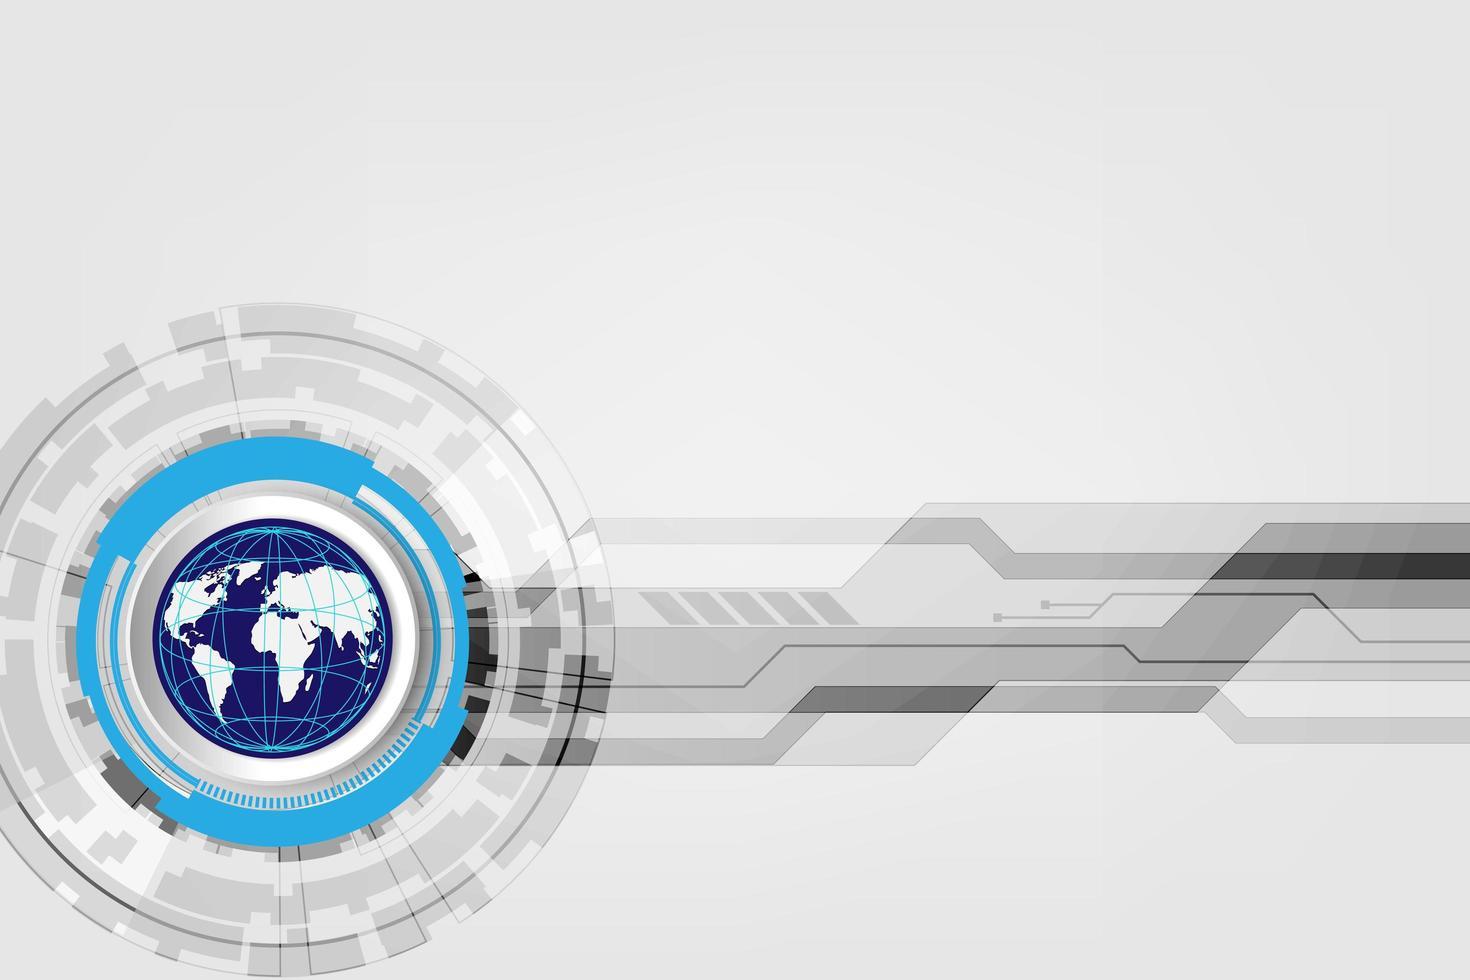 concepto de tecnología global digital, fondo abstracto vector